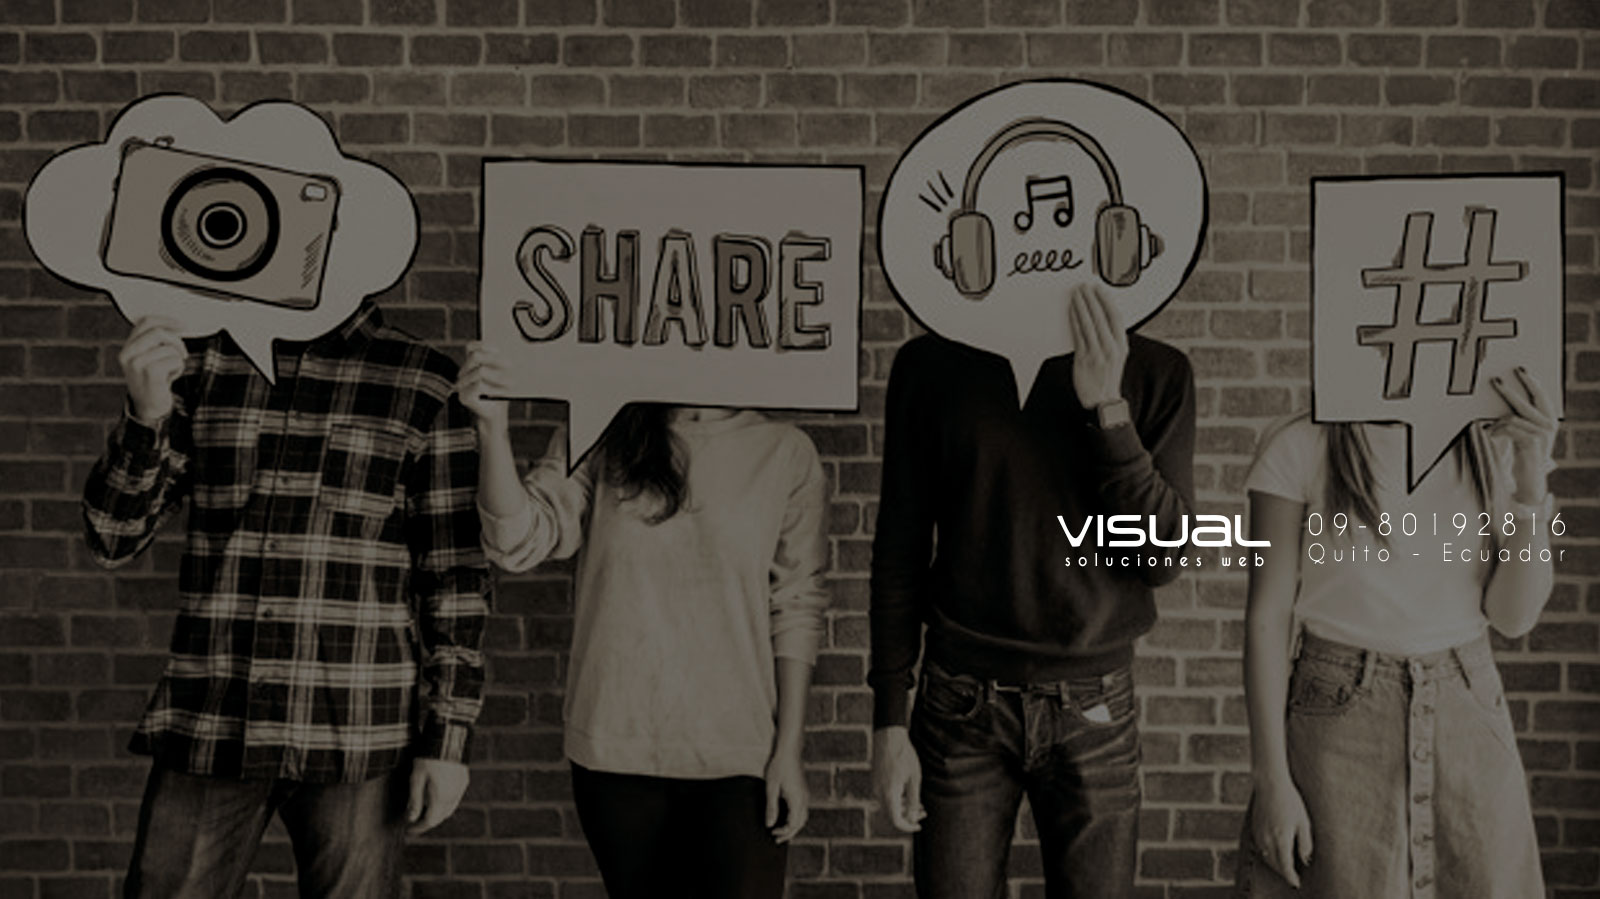 redes-sociales-community-manager-quito-ecuador